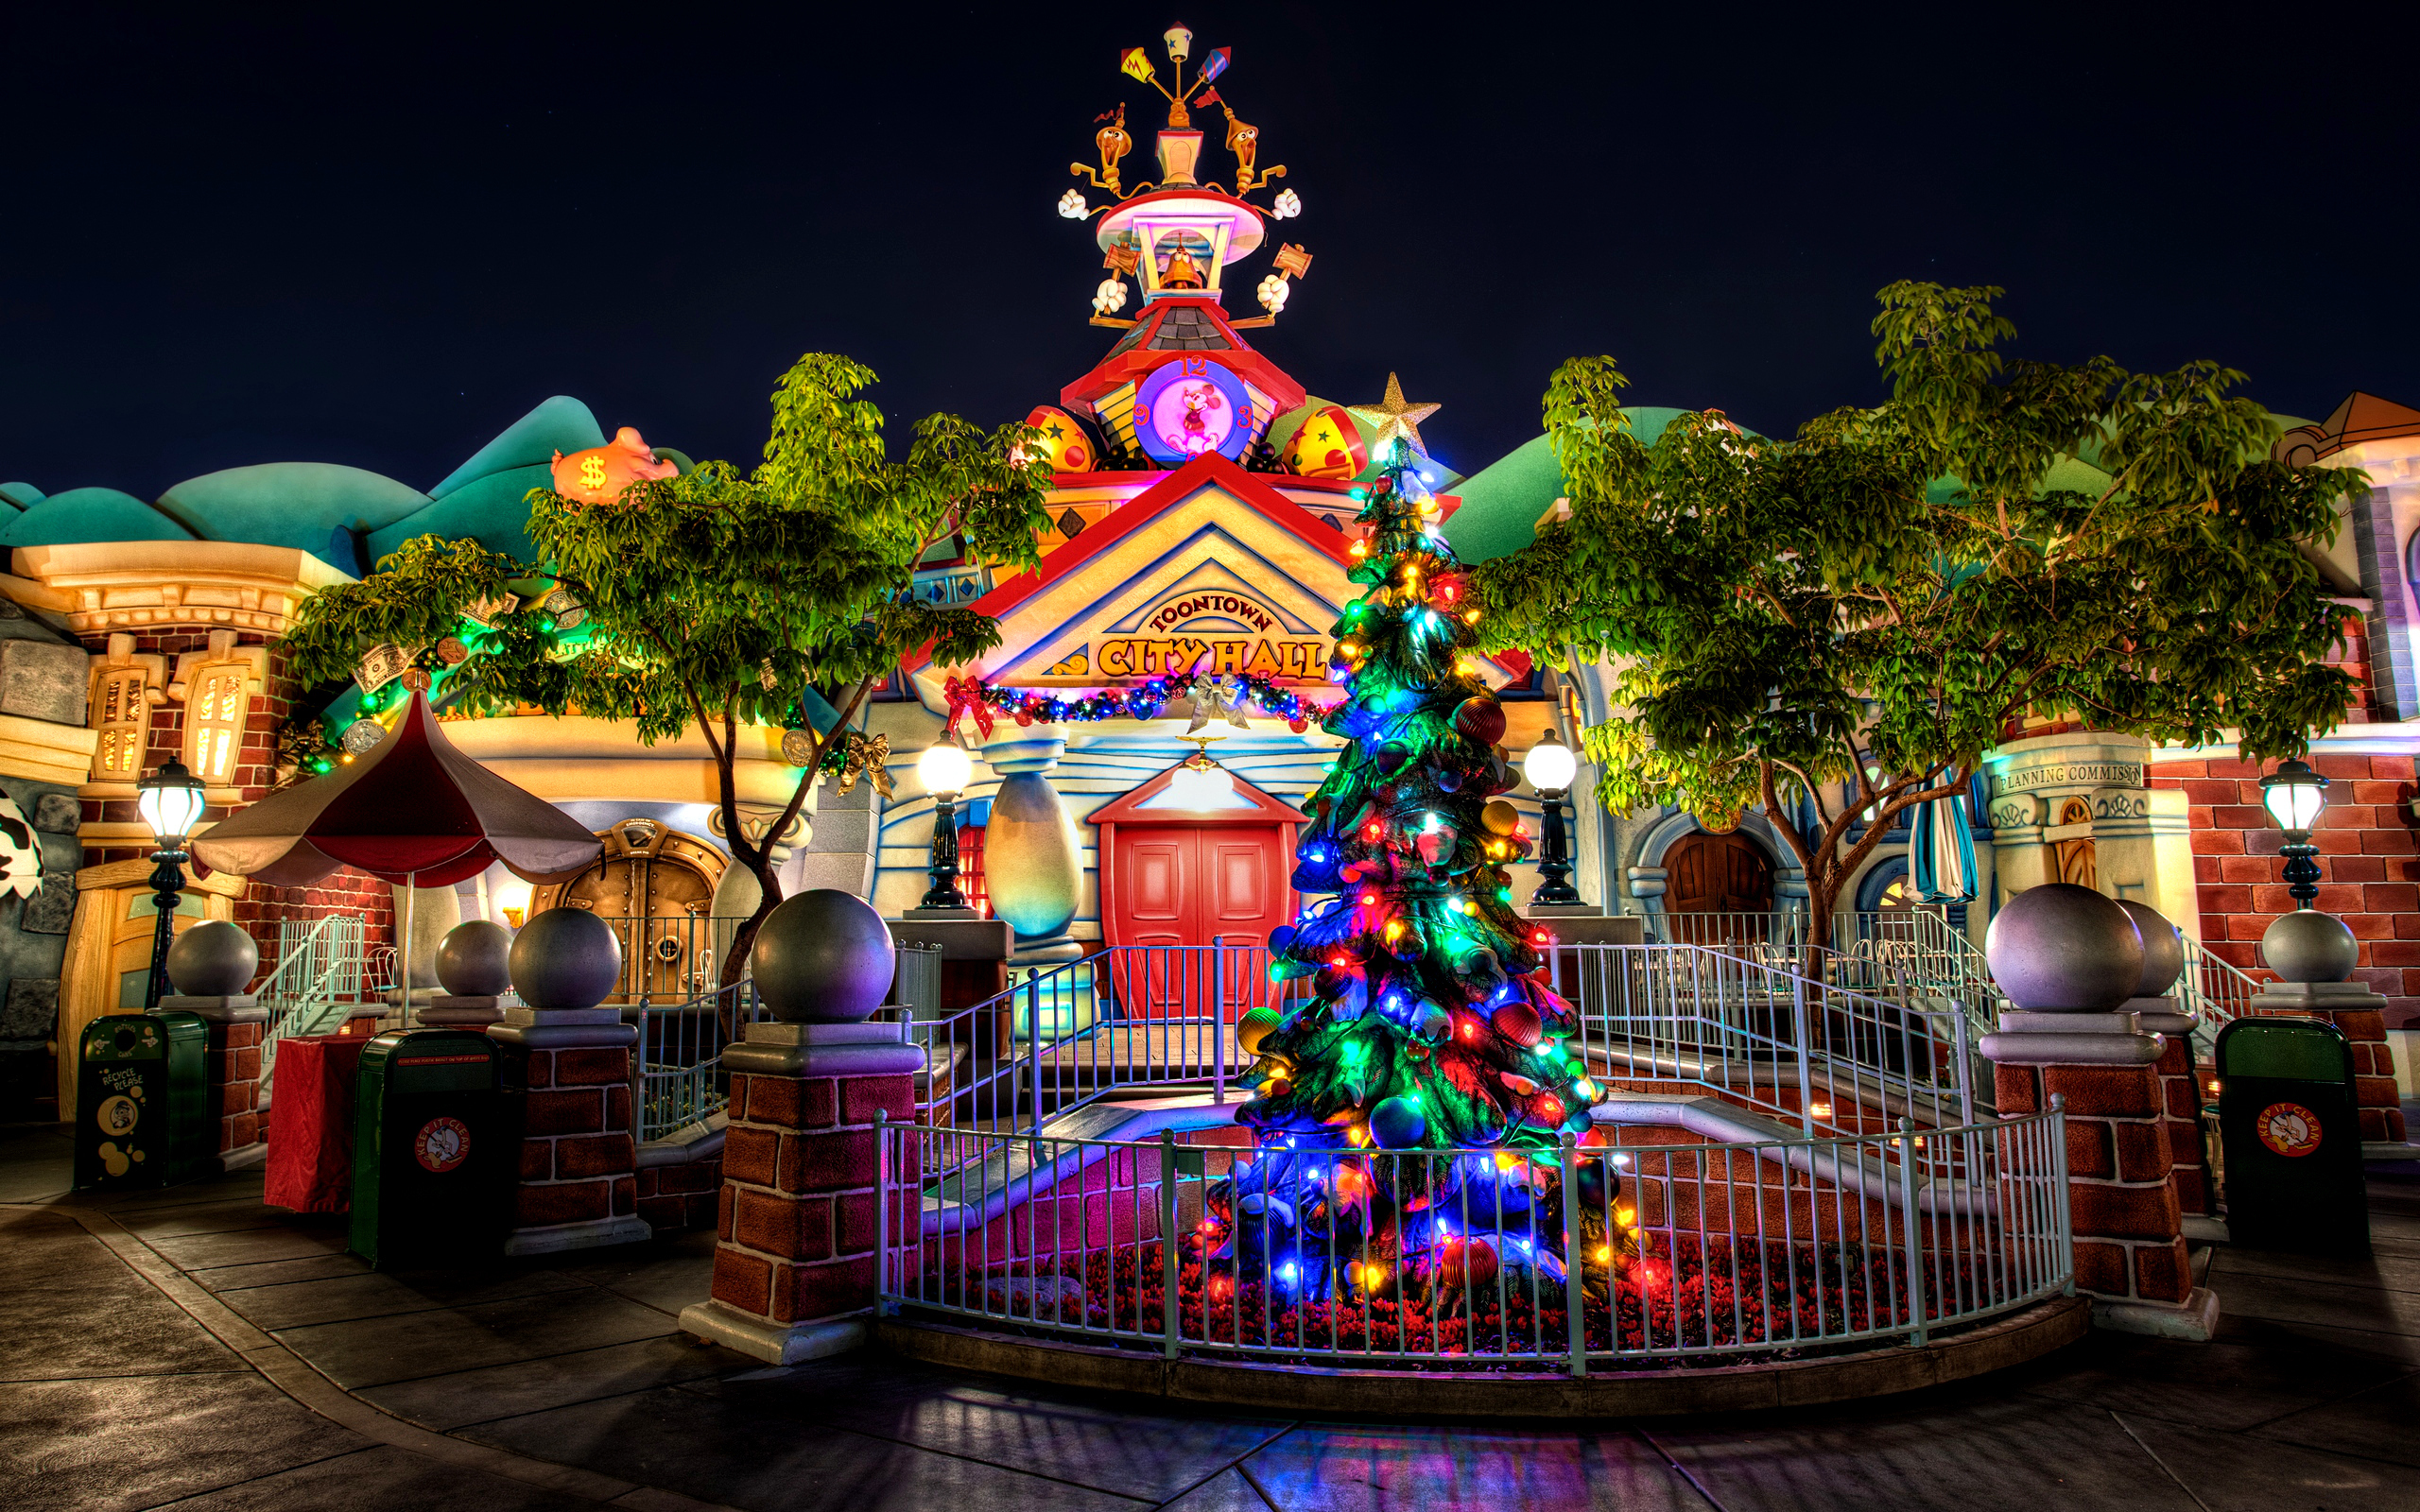 disney disneyland night lights city new year christmas holiday 2560x1600